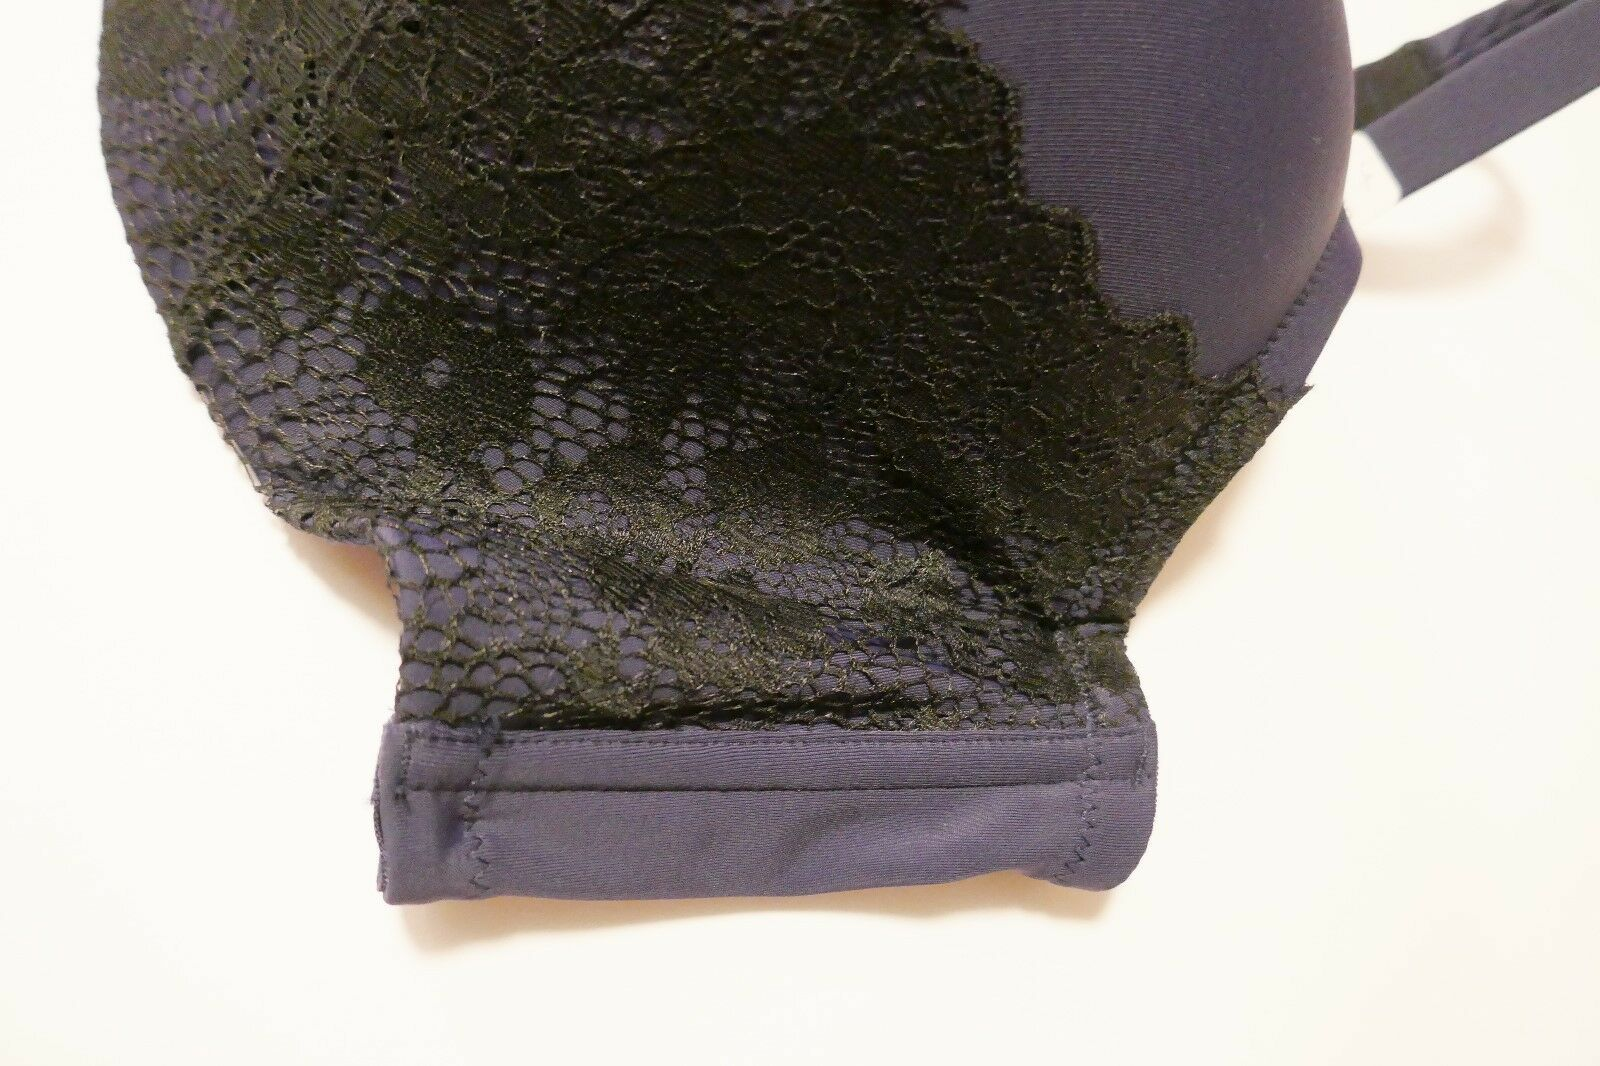 1228f39b19 Thyme Maternity Bra Size 44 DDD Navy Blue Black Lace Bra MSRP $60